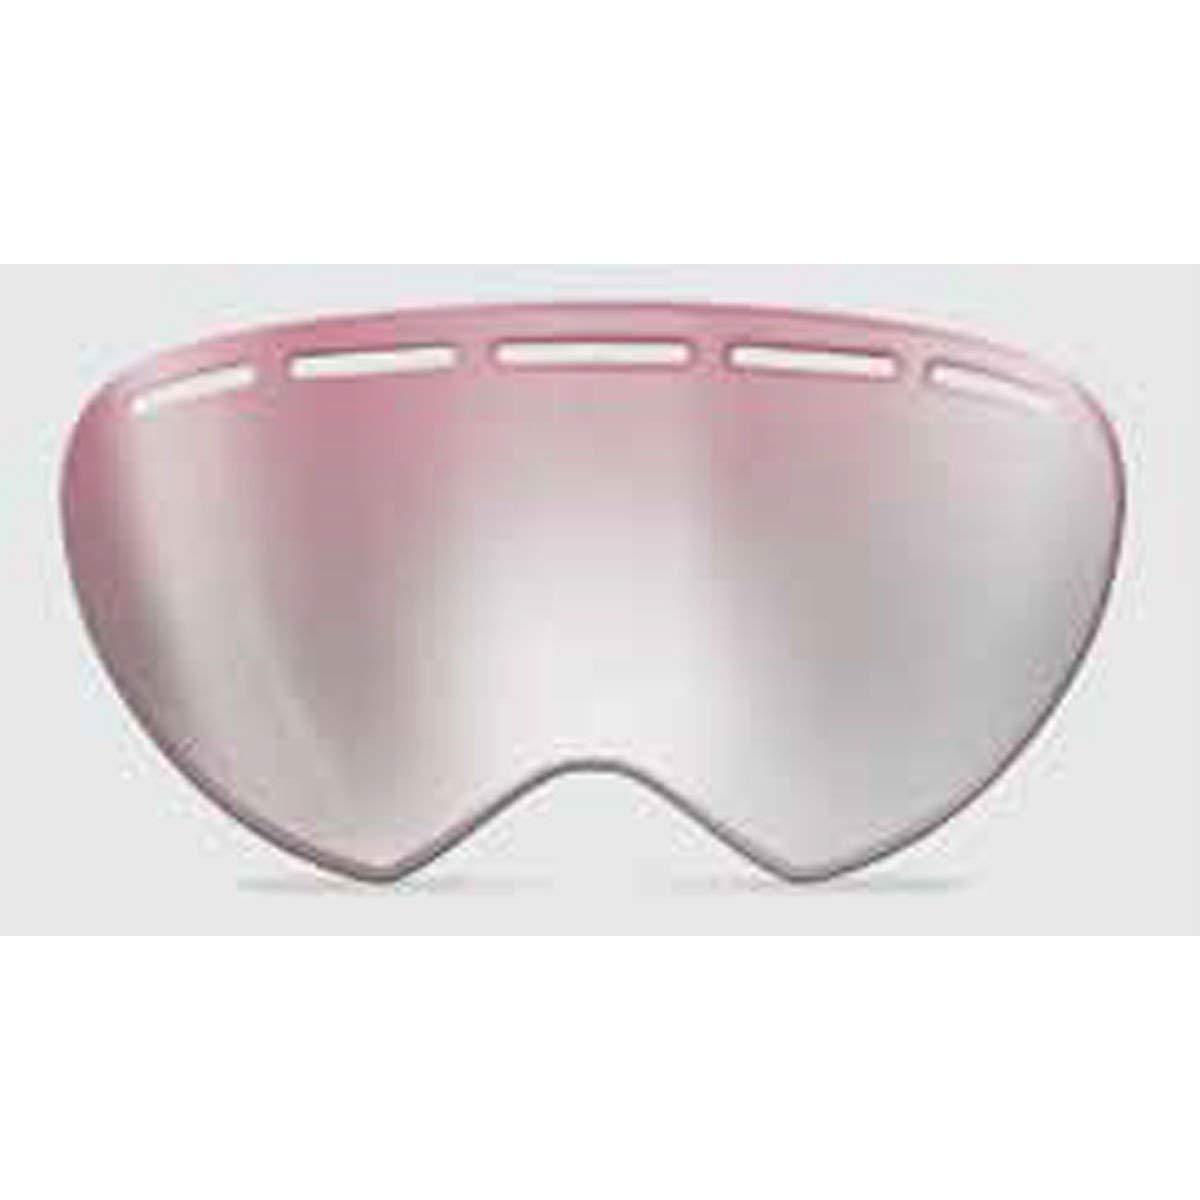 411962dee0 Get Quotations · Bolle 50561 Replacement Lenses Modulator Nova II  Sunglasses